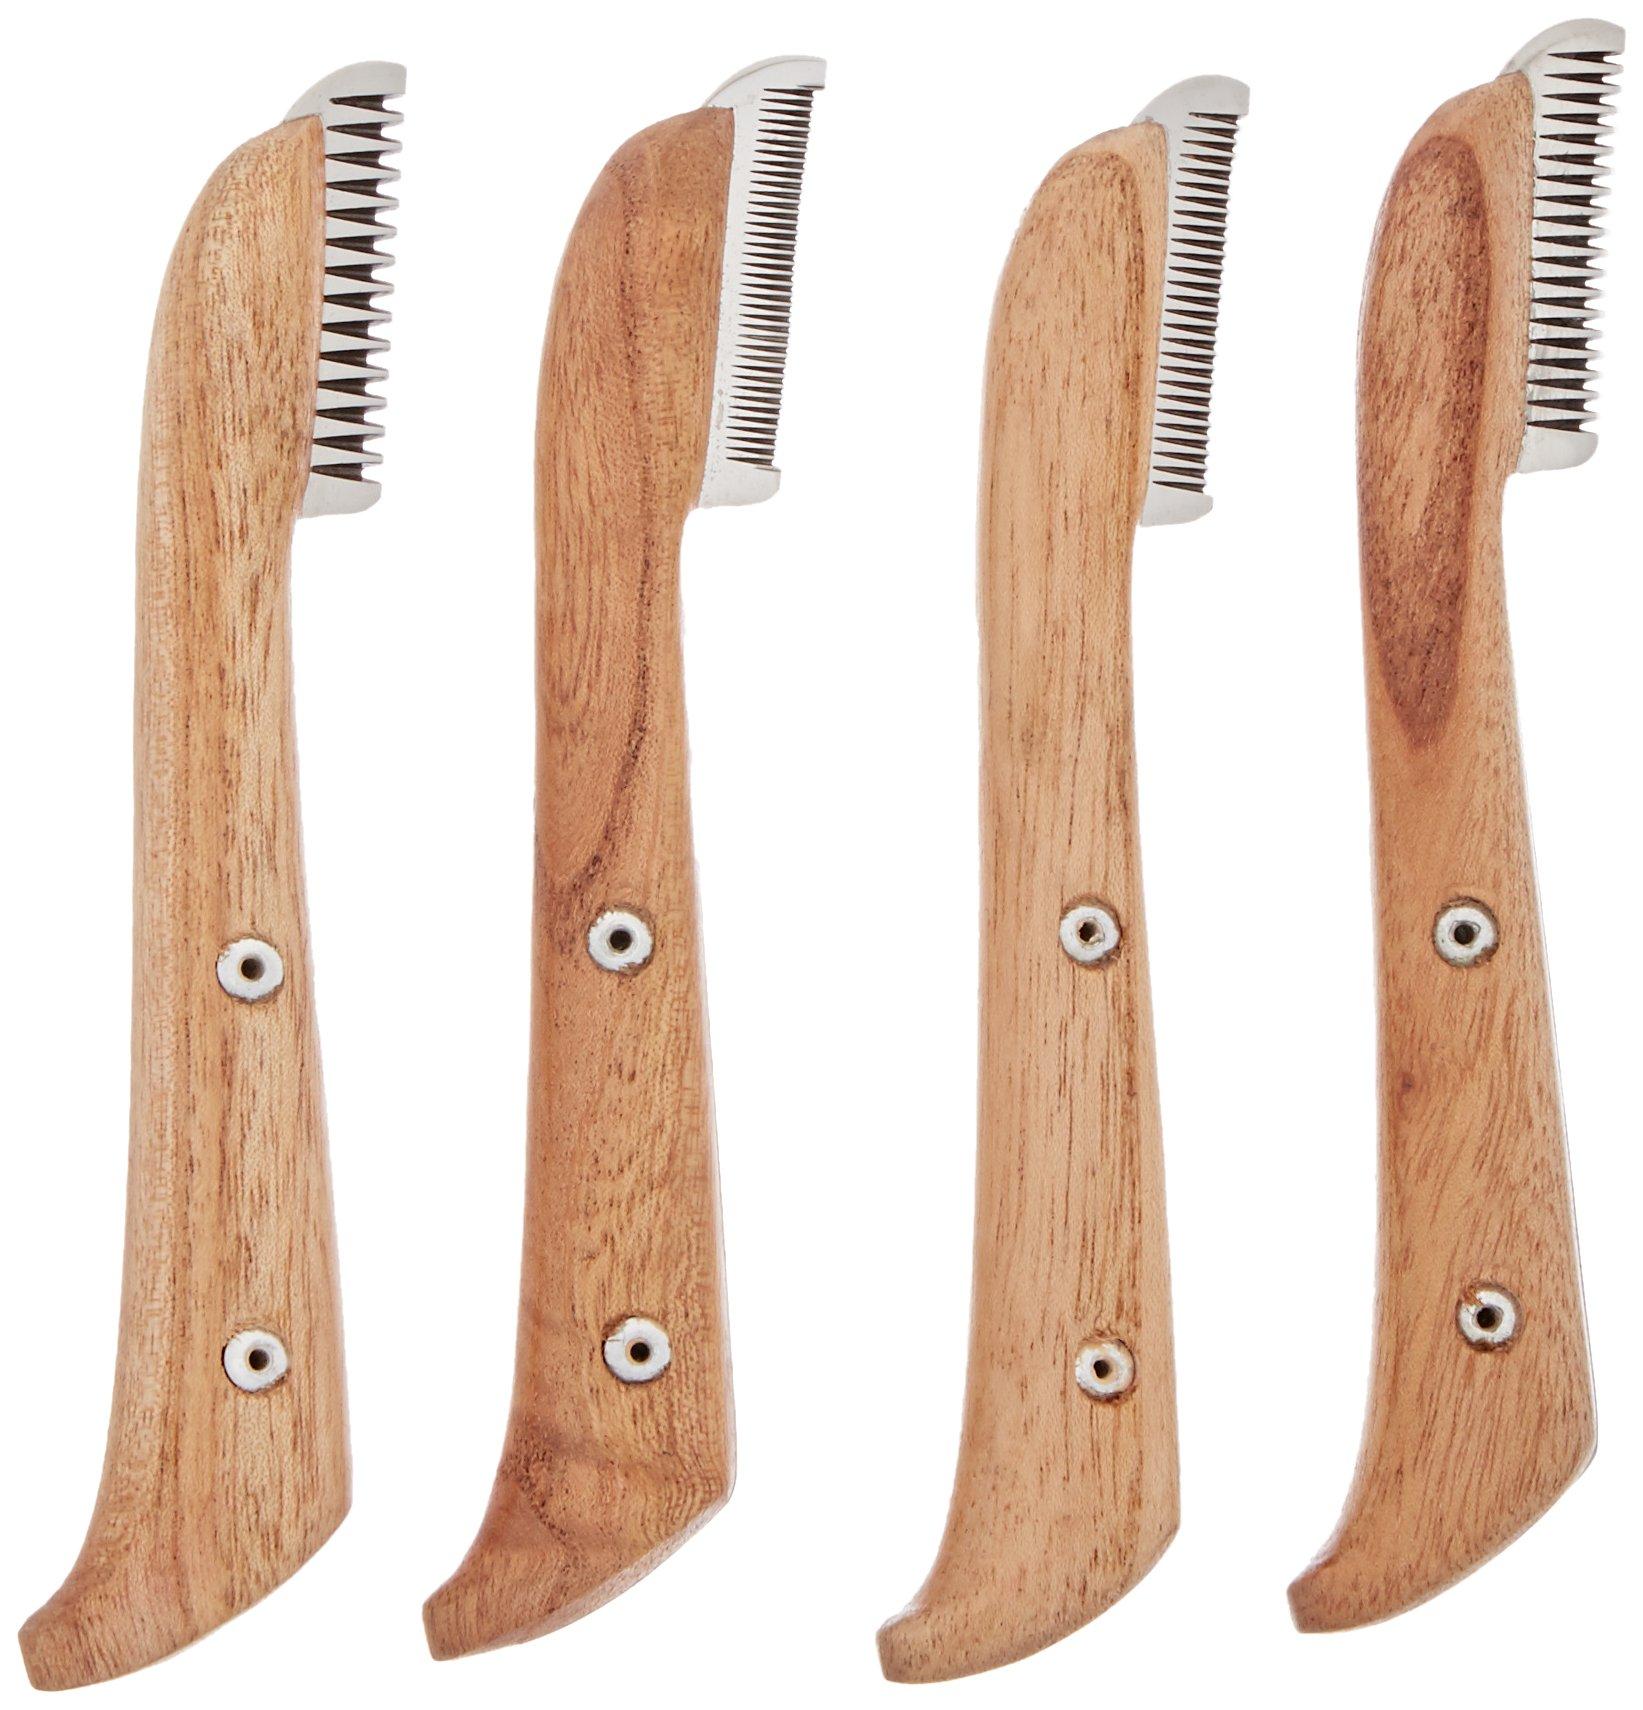 TAMSCO Stripping Knives Set Of 4 In Felt Box Felt Box Stainless Steel Stainless Steel